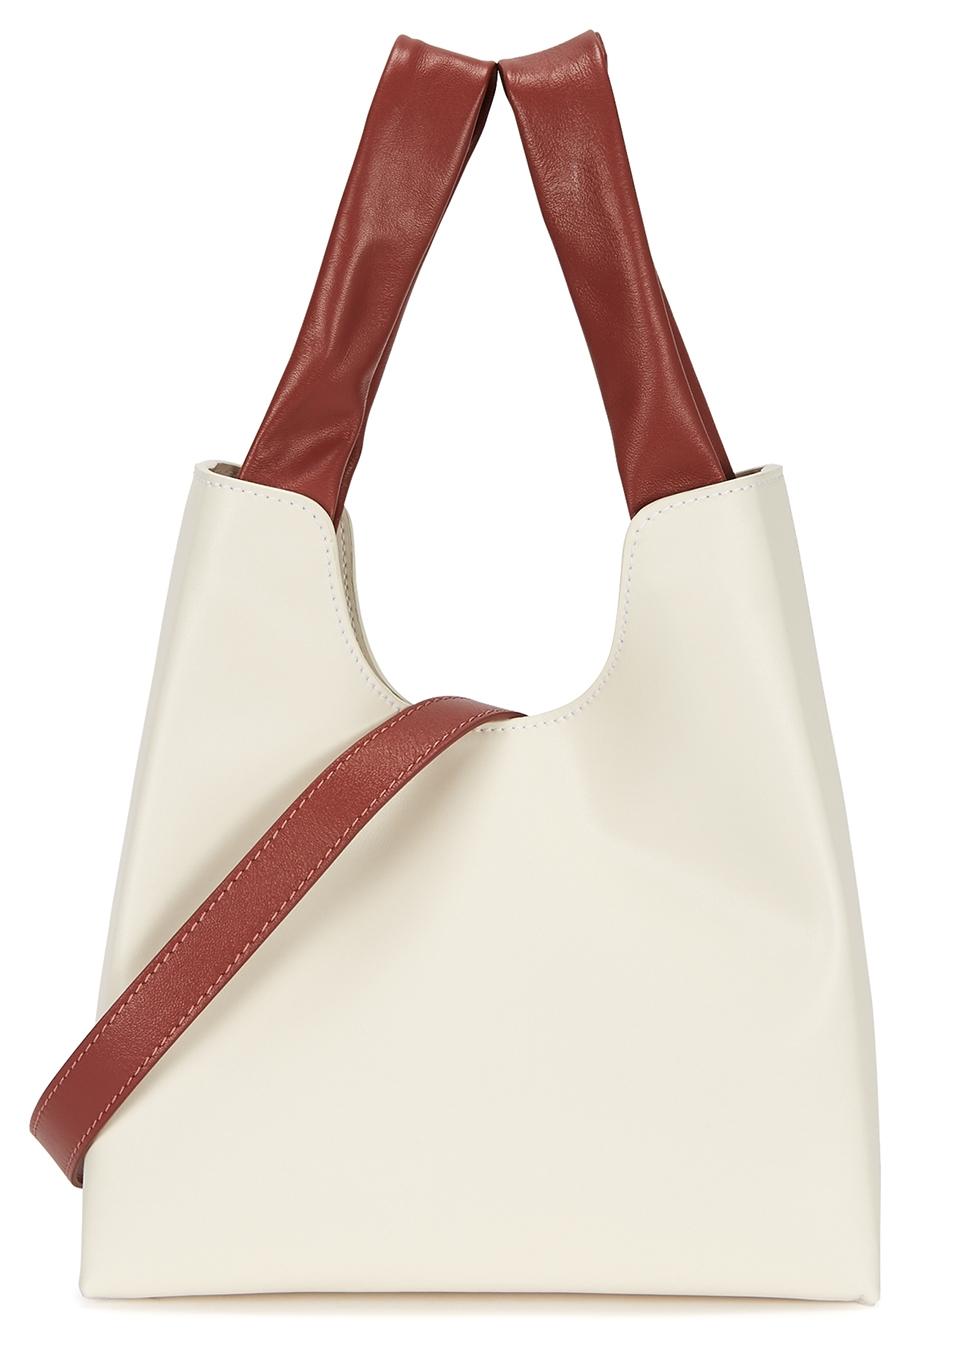 White leather shopper tote - ELLEME